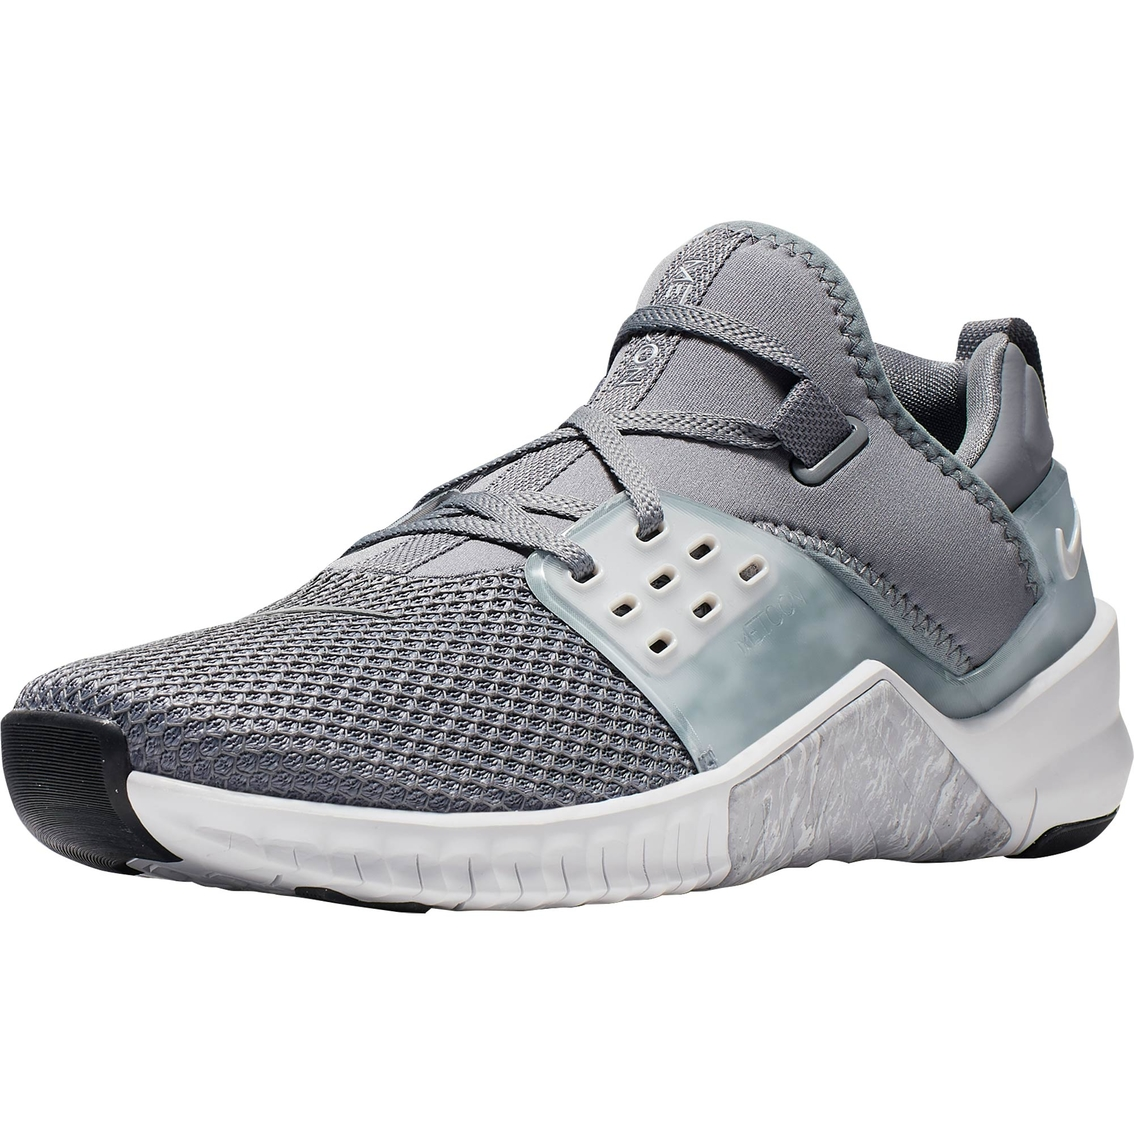 Free X Metcon 2 Training Shoes